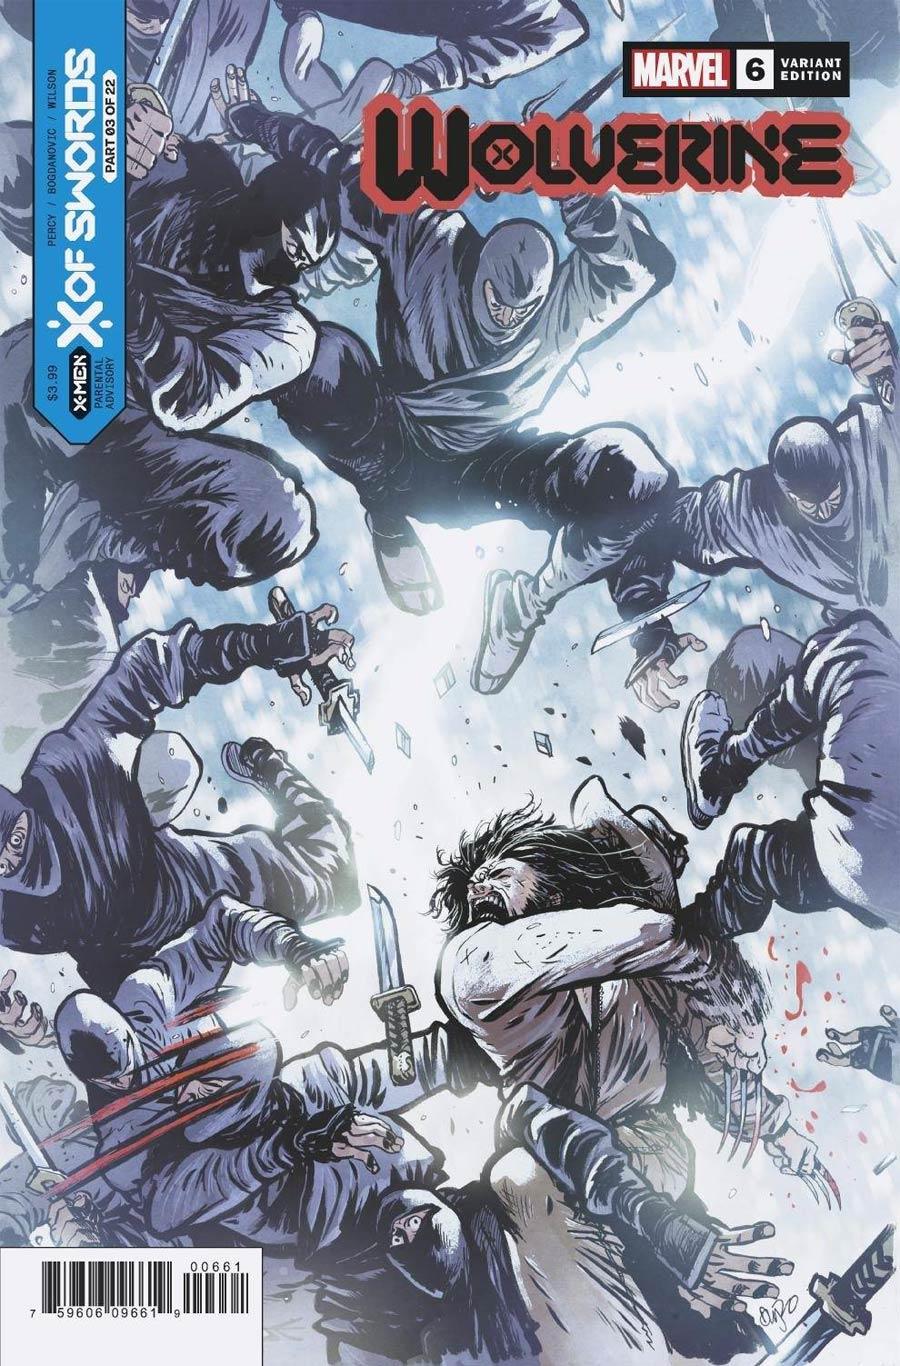 Wolverine Vol 7 #6 Cover C Variant Daniel Warren Johnson Cover (X Of Swords Part 3)